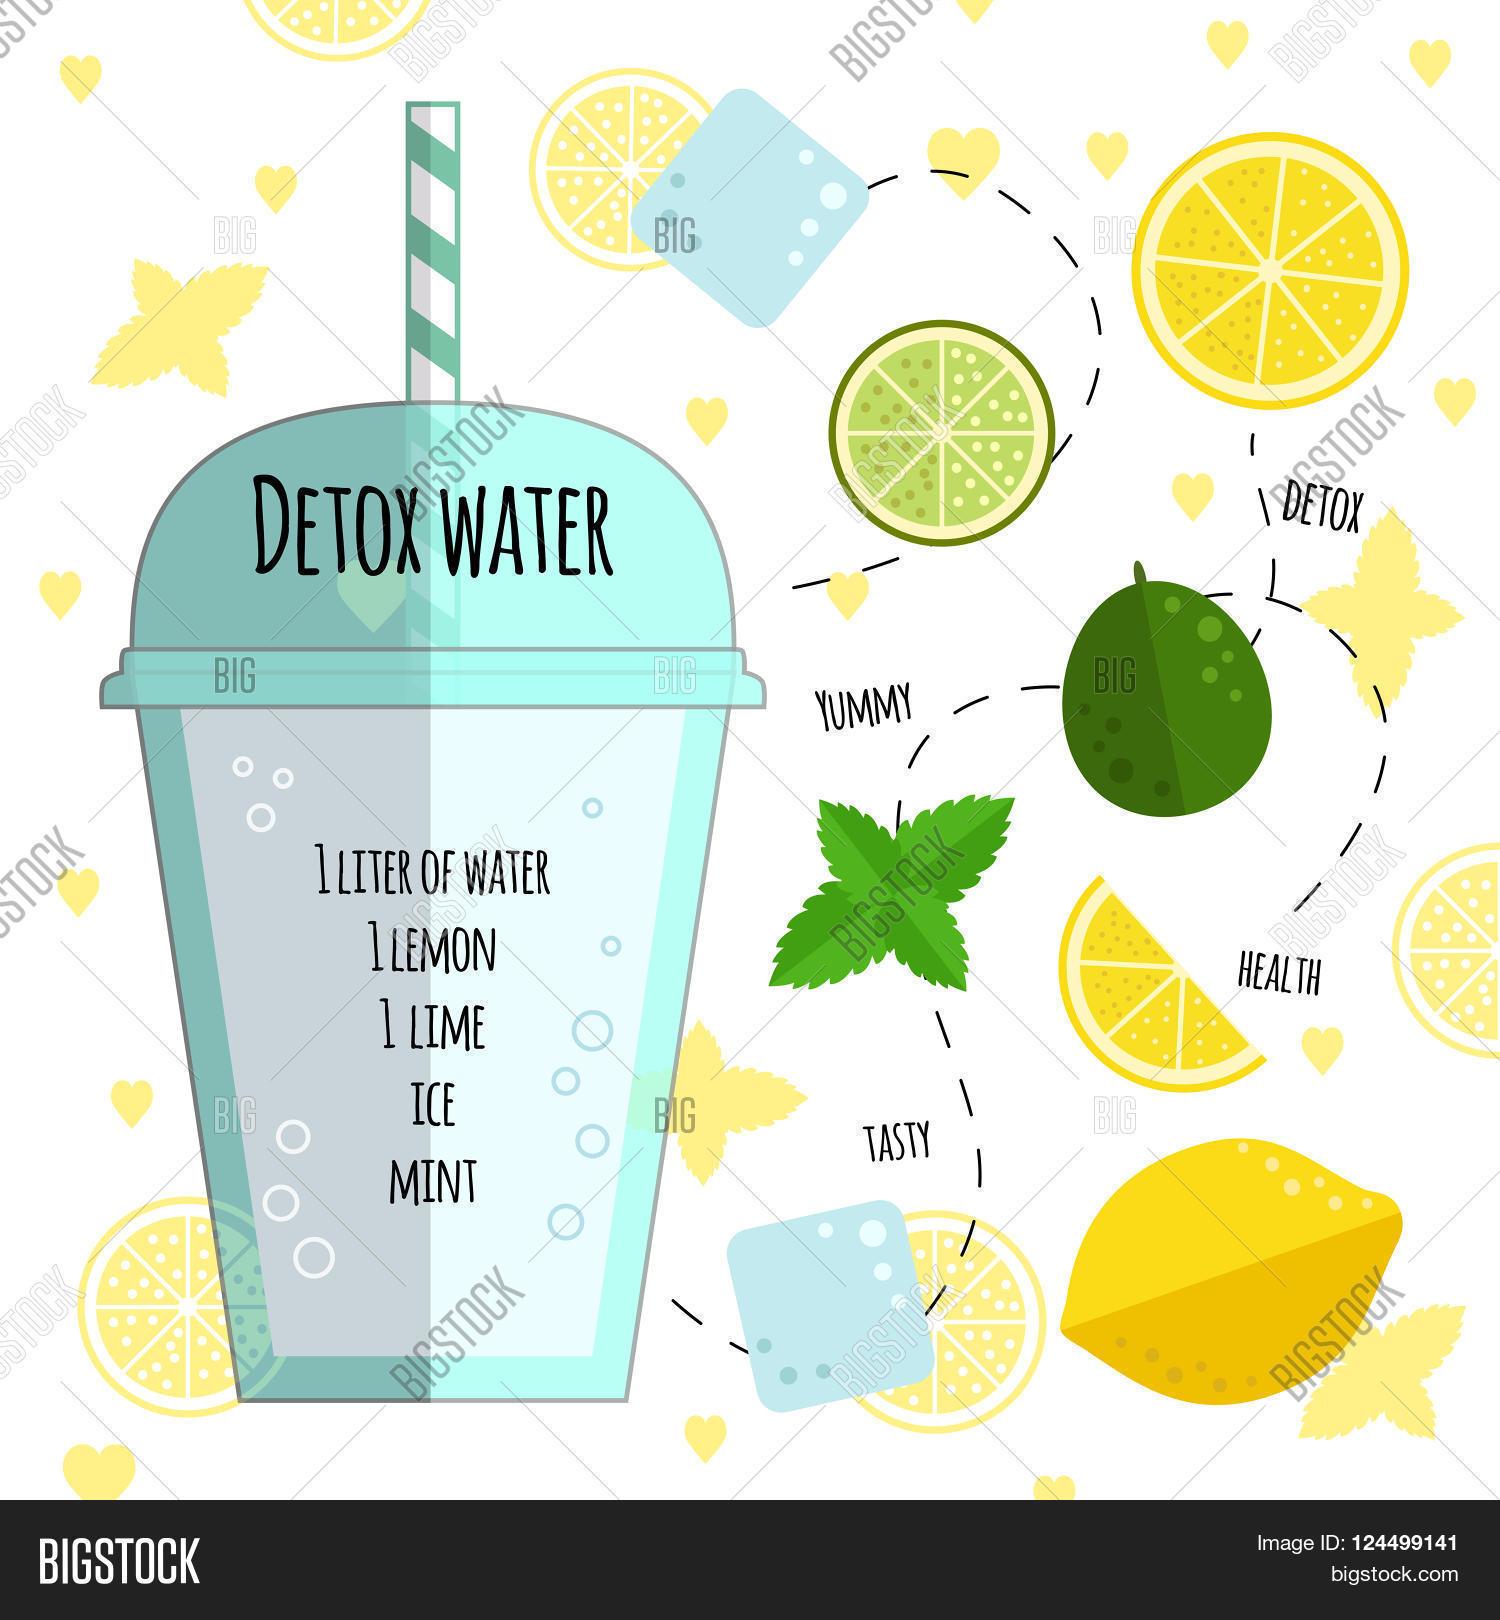 Recipe Detox Water Vector Photo Free Trial Bigstock